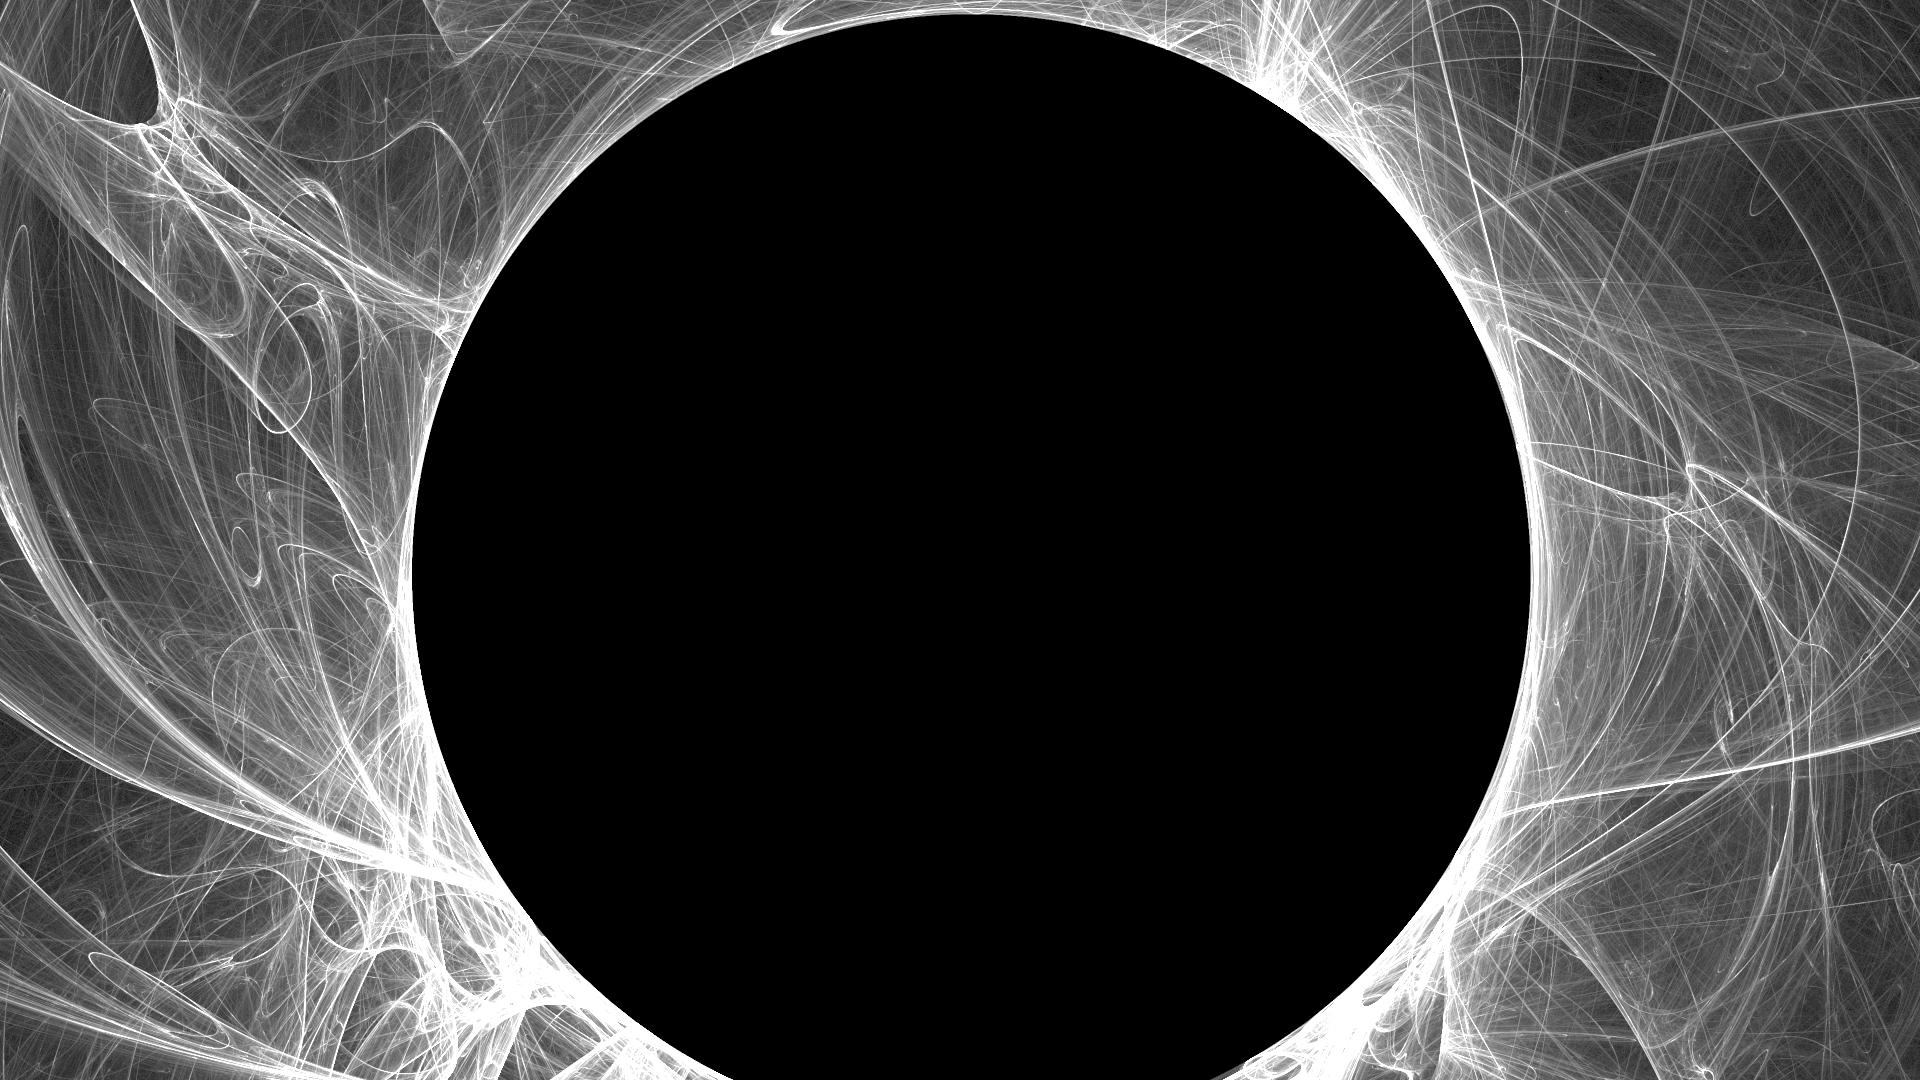 Black Hole Sun v3 by NaturalChemical on DeviantArt